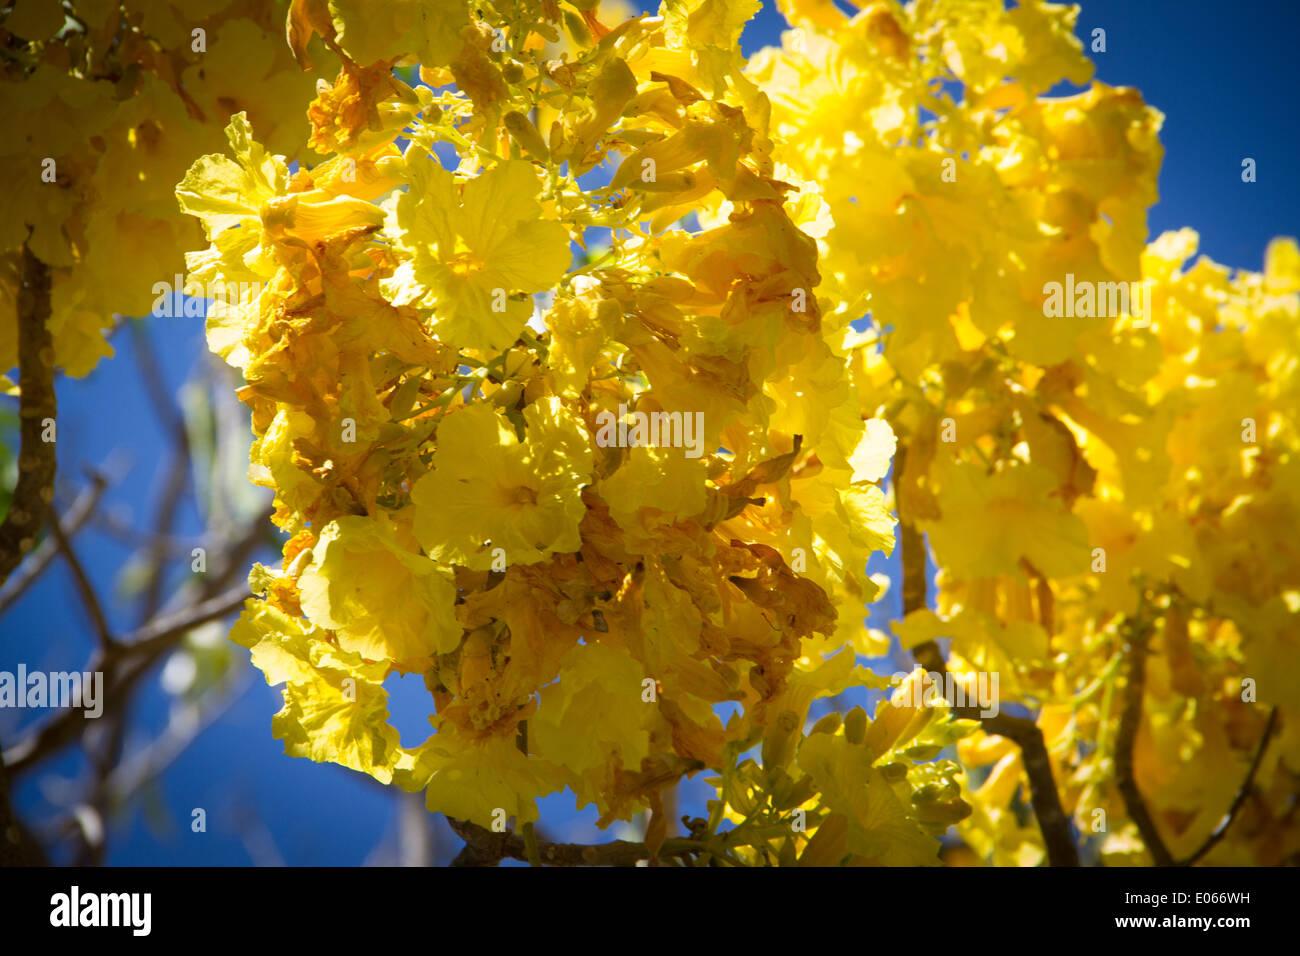 Yellow flower tree jalisco mexico stock photo 68978605 alamy yellow flower tree jalisco mexico mightylinksfo